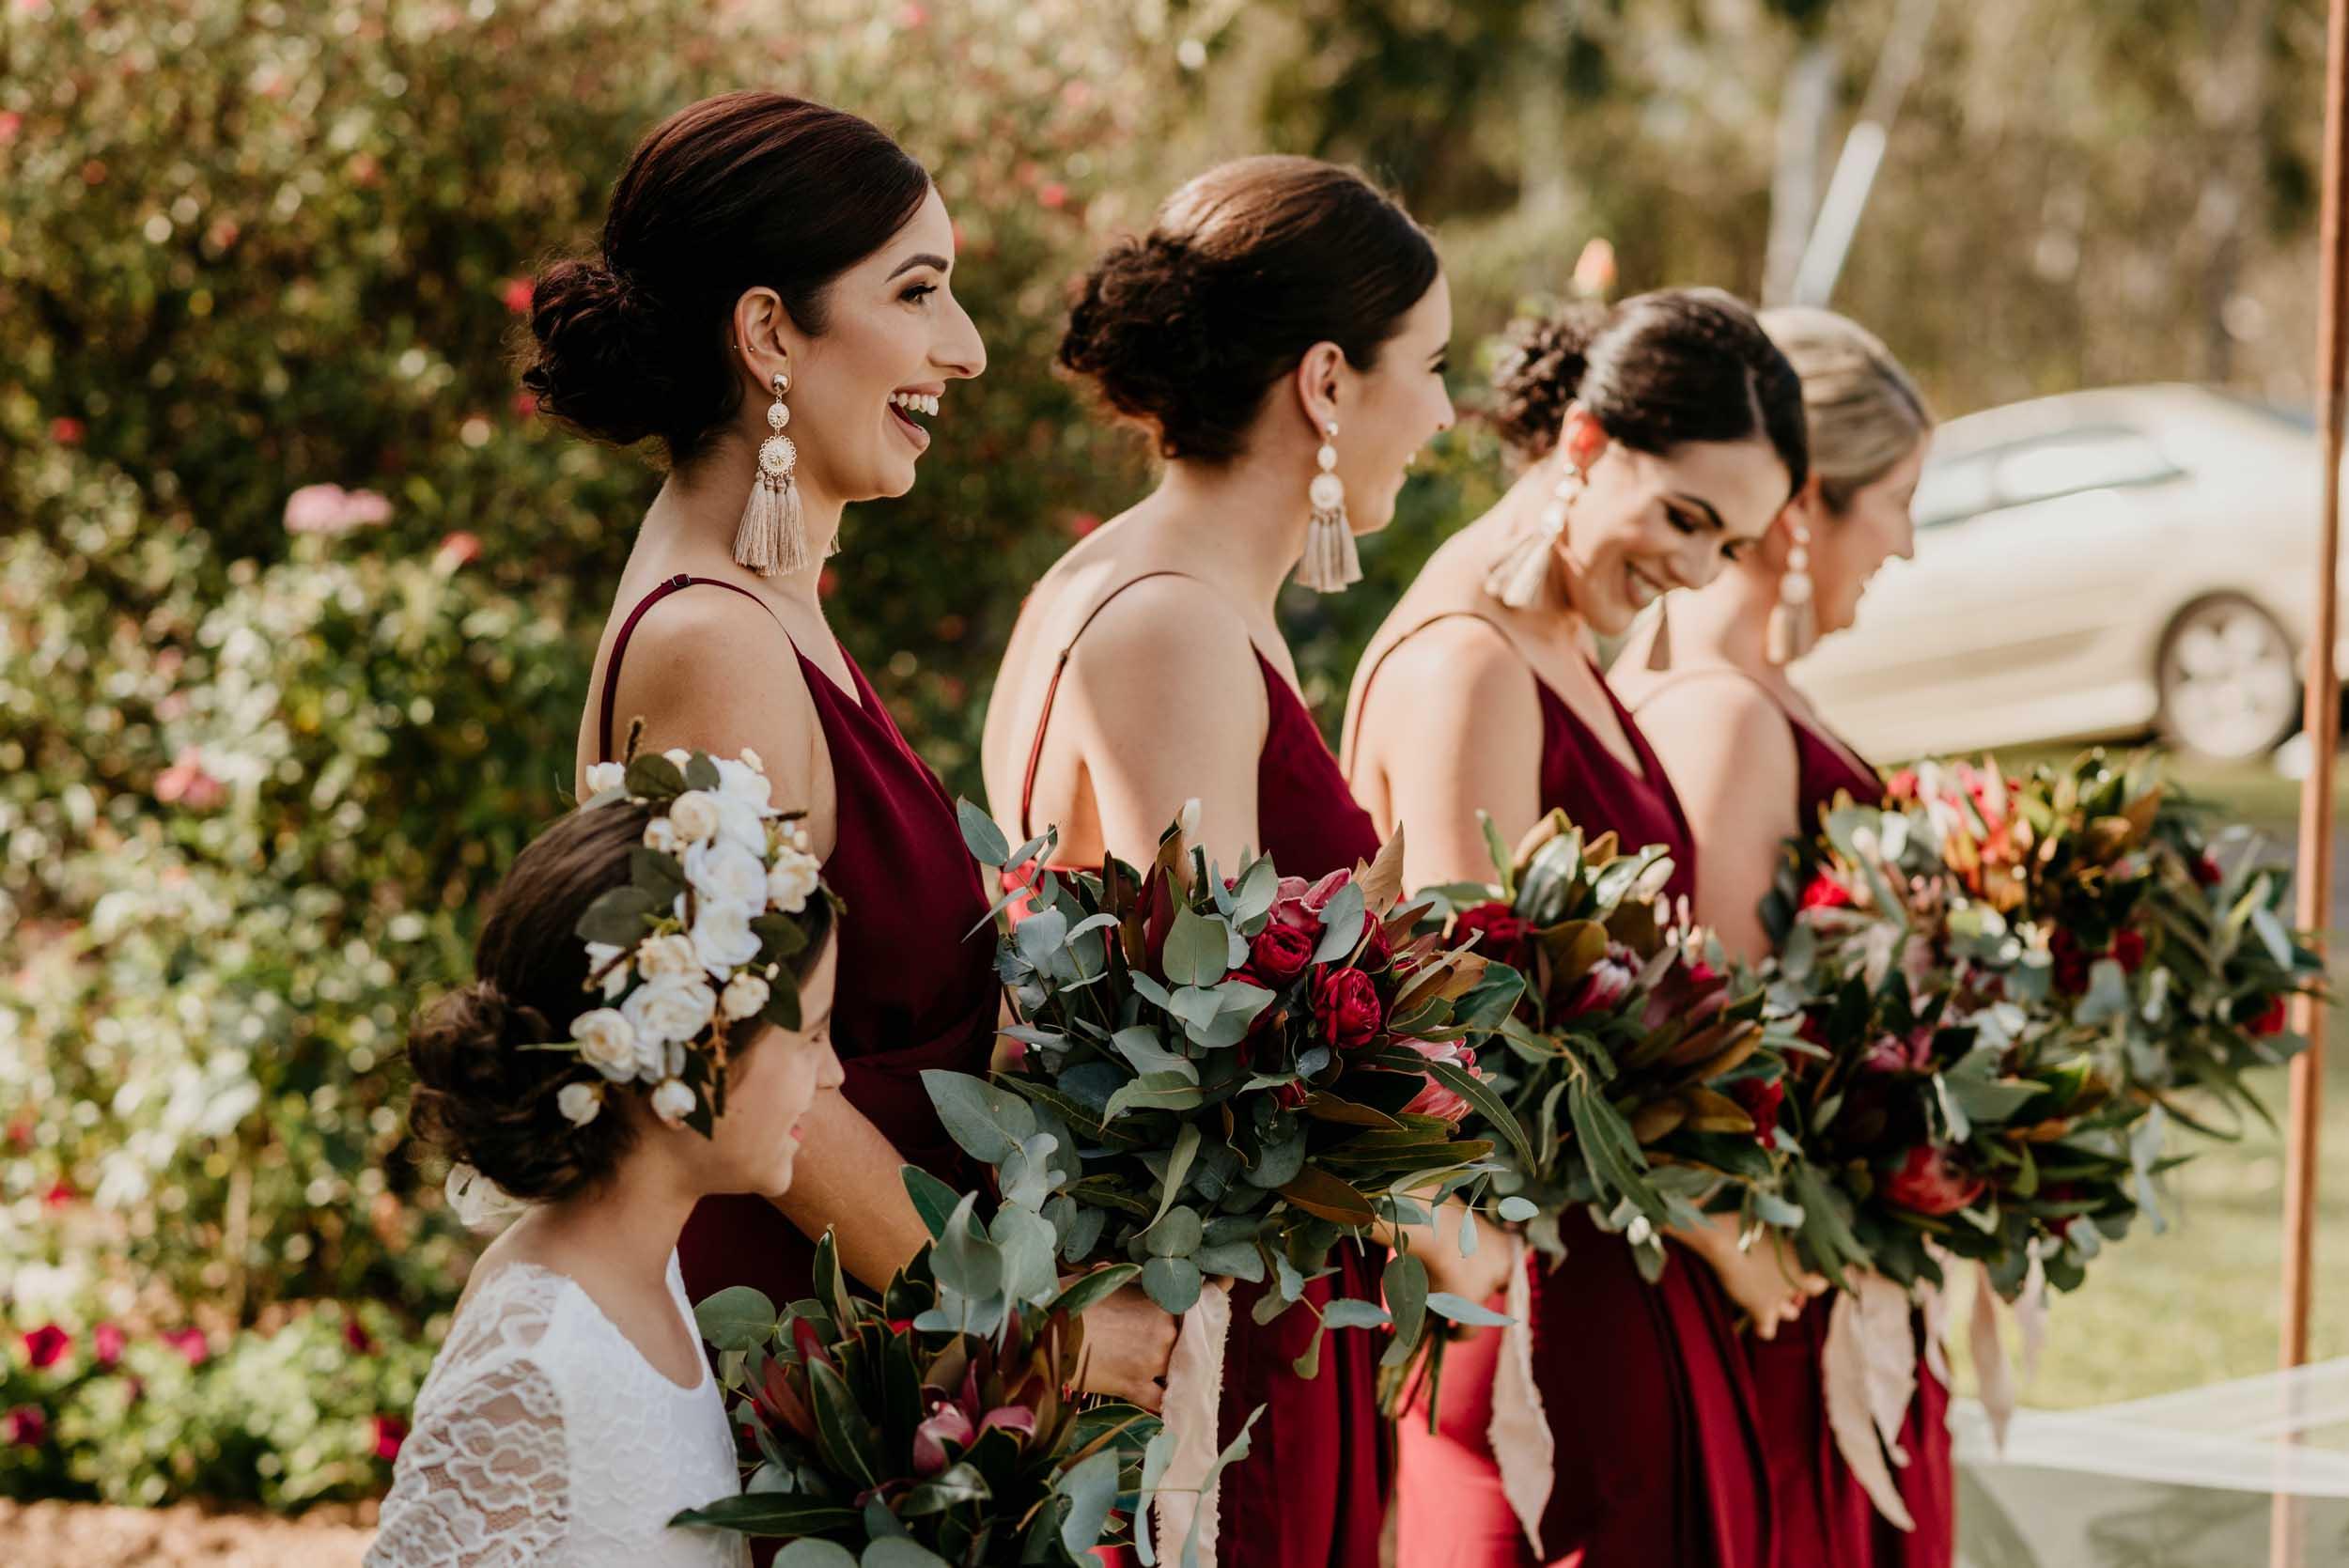 The Raw Photographer - Cairns Wedding Photographer - Atherton Tablelands - Mareeba farm Wedding - Irene Costa's Devine Bridal - Candid - Photo Package-24.jpg